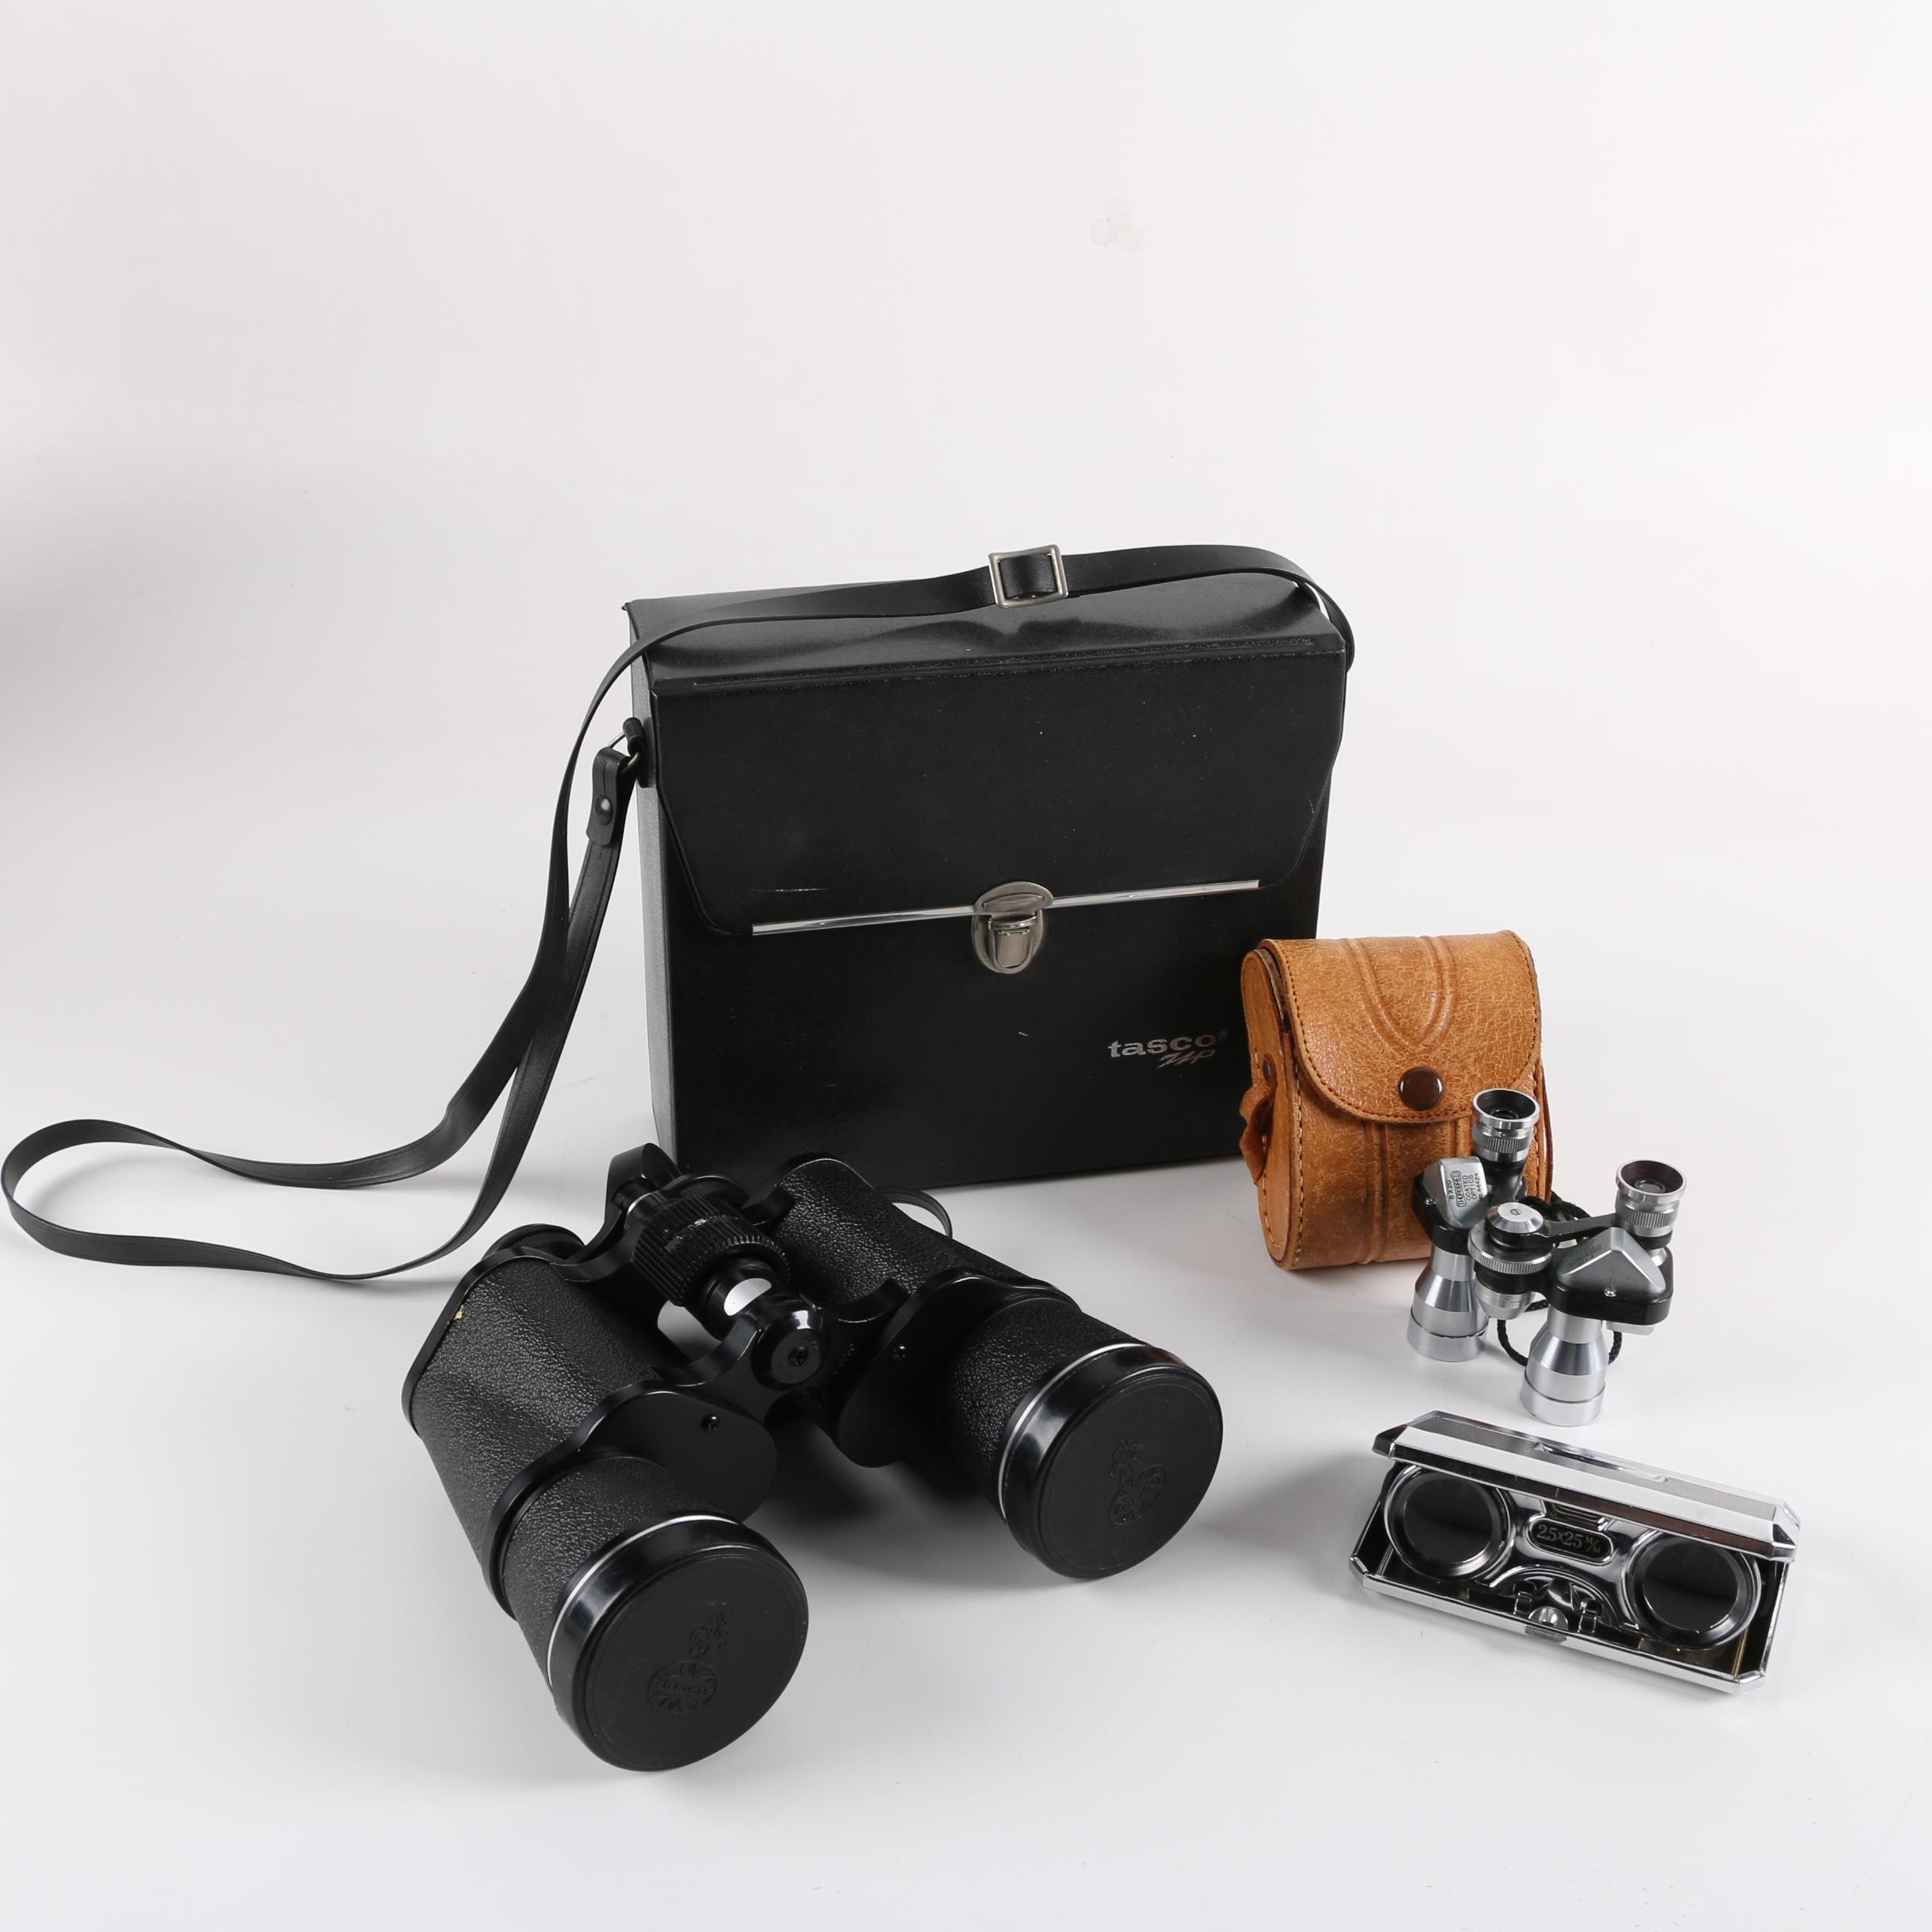 Tasco Zip 312Z 10x50, Yoshida Thorobred 8x20 and Focal 2.5x25 Binoculars